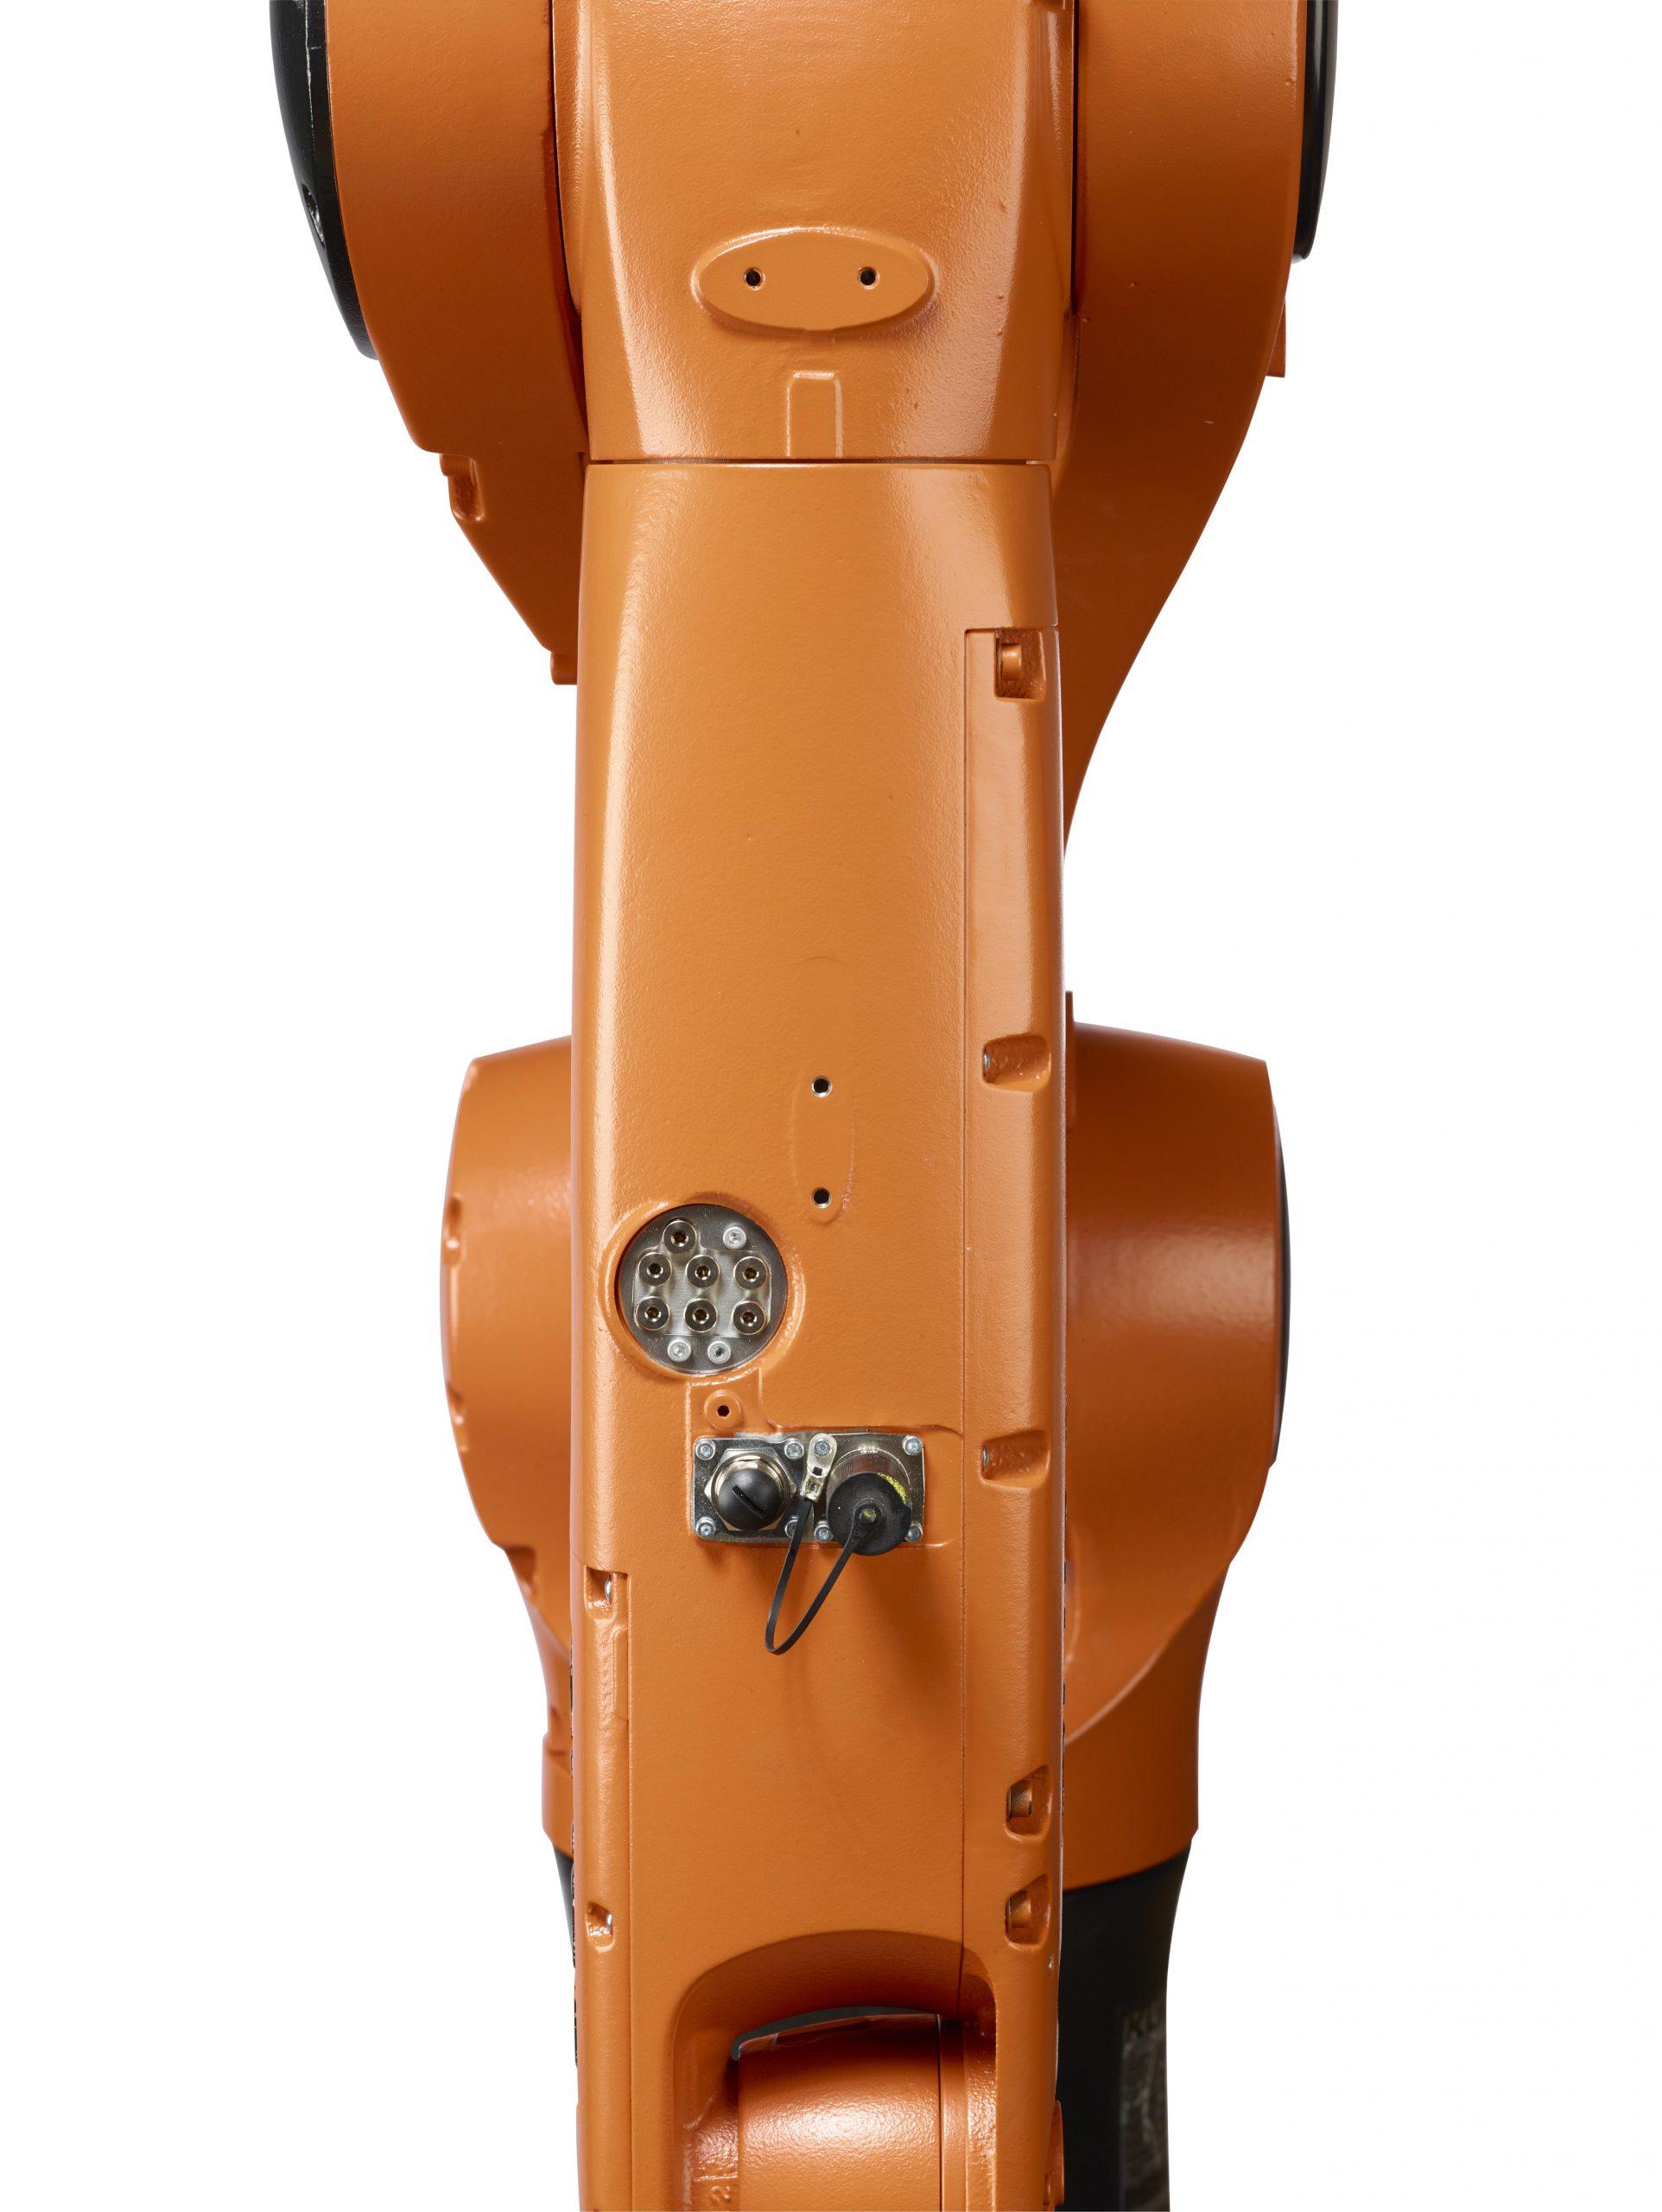 KUKA KR 6 R700 sixx WP (KR AGILUS)-8